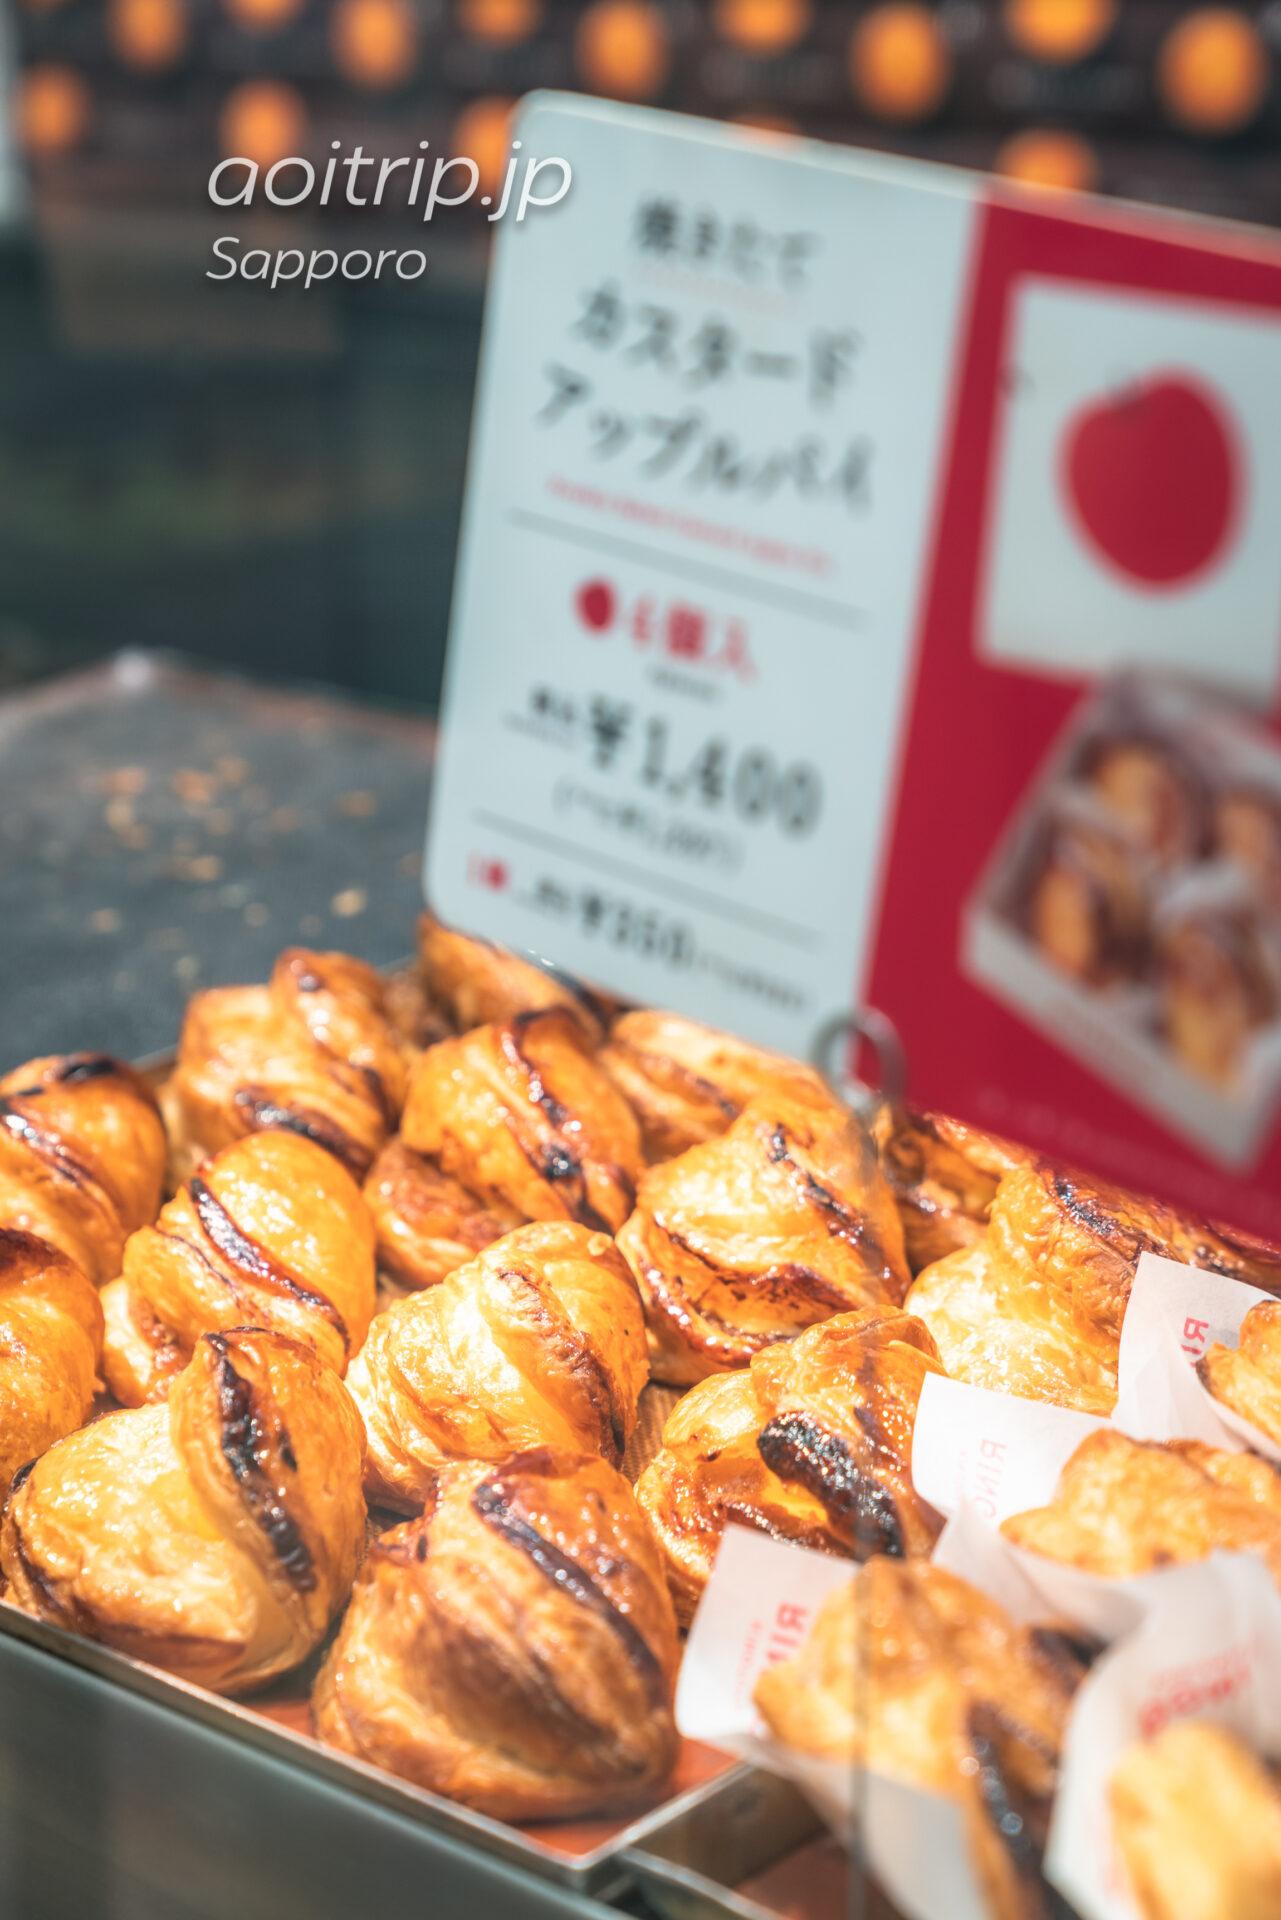 Kinotoya Bakeポールタウン店 カスタードアップルパイ